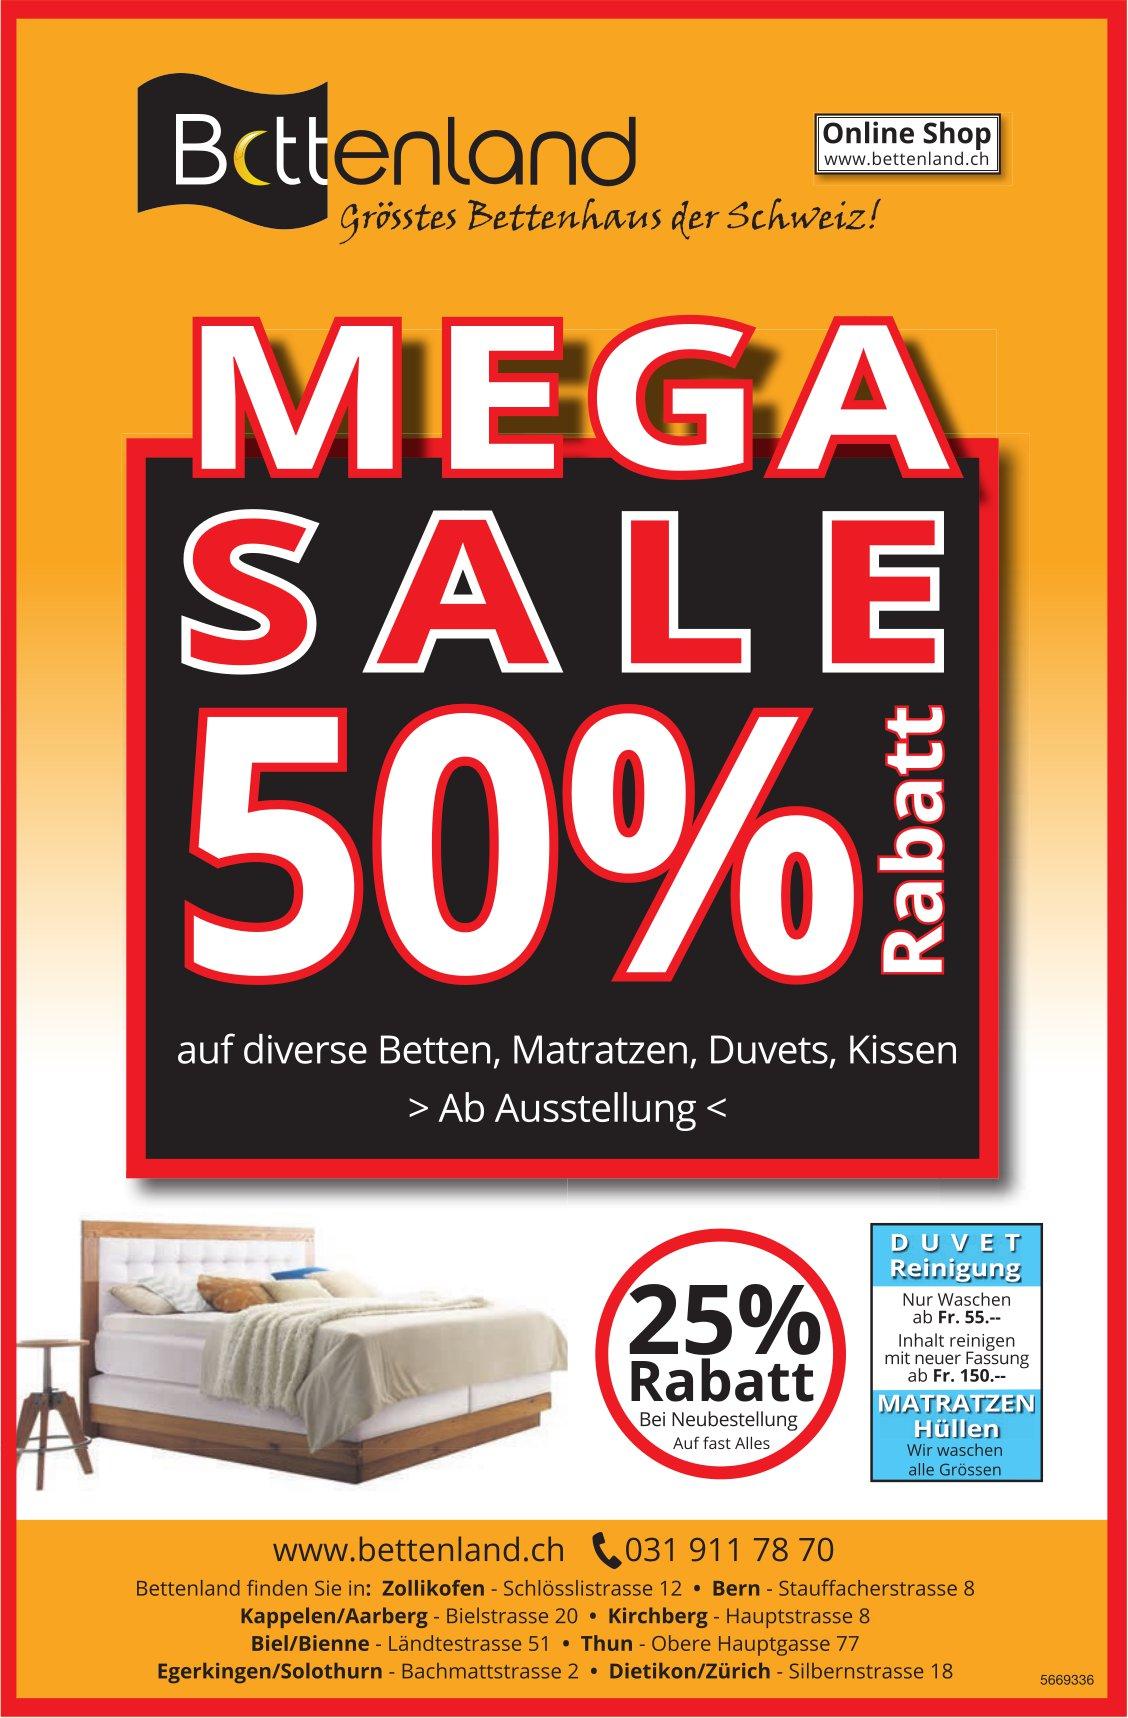 Bettenland - Mega Sale 50% Rabatt